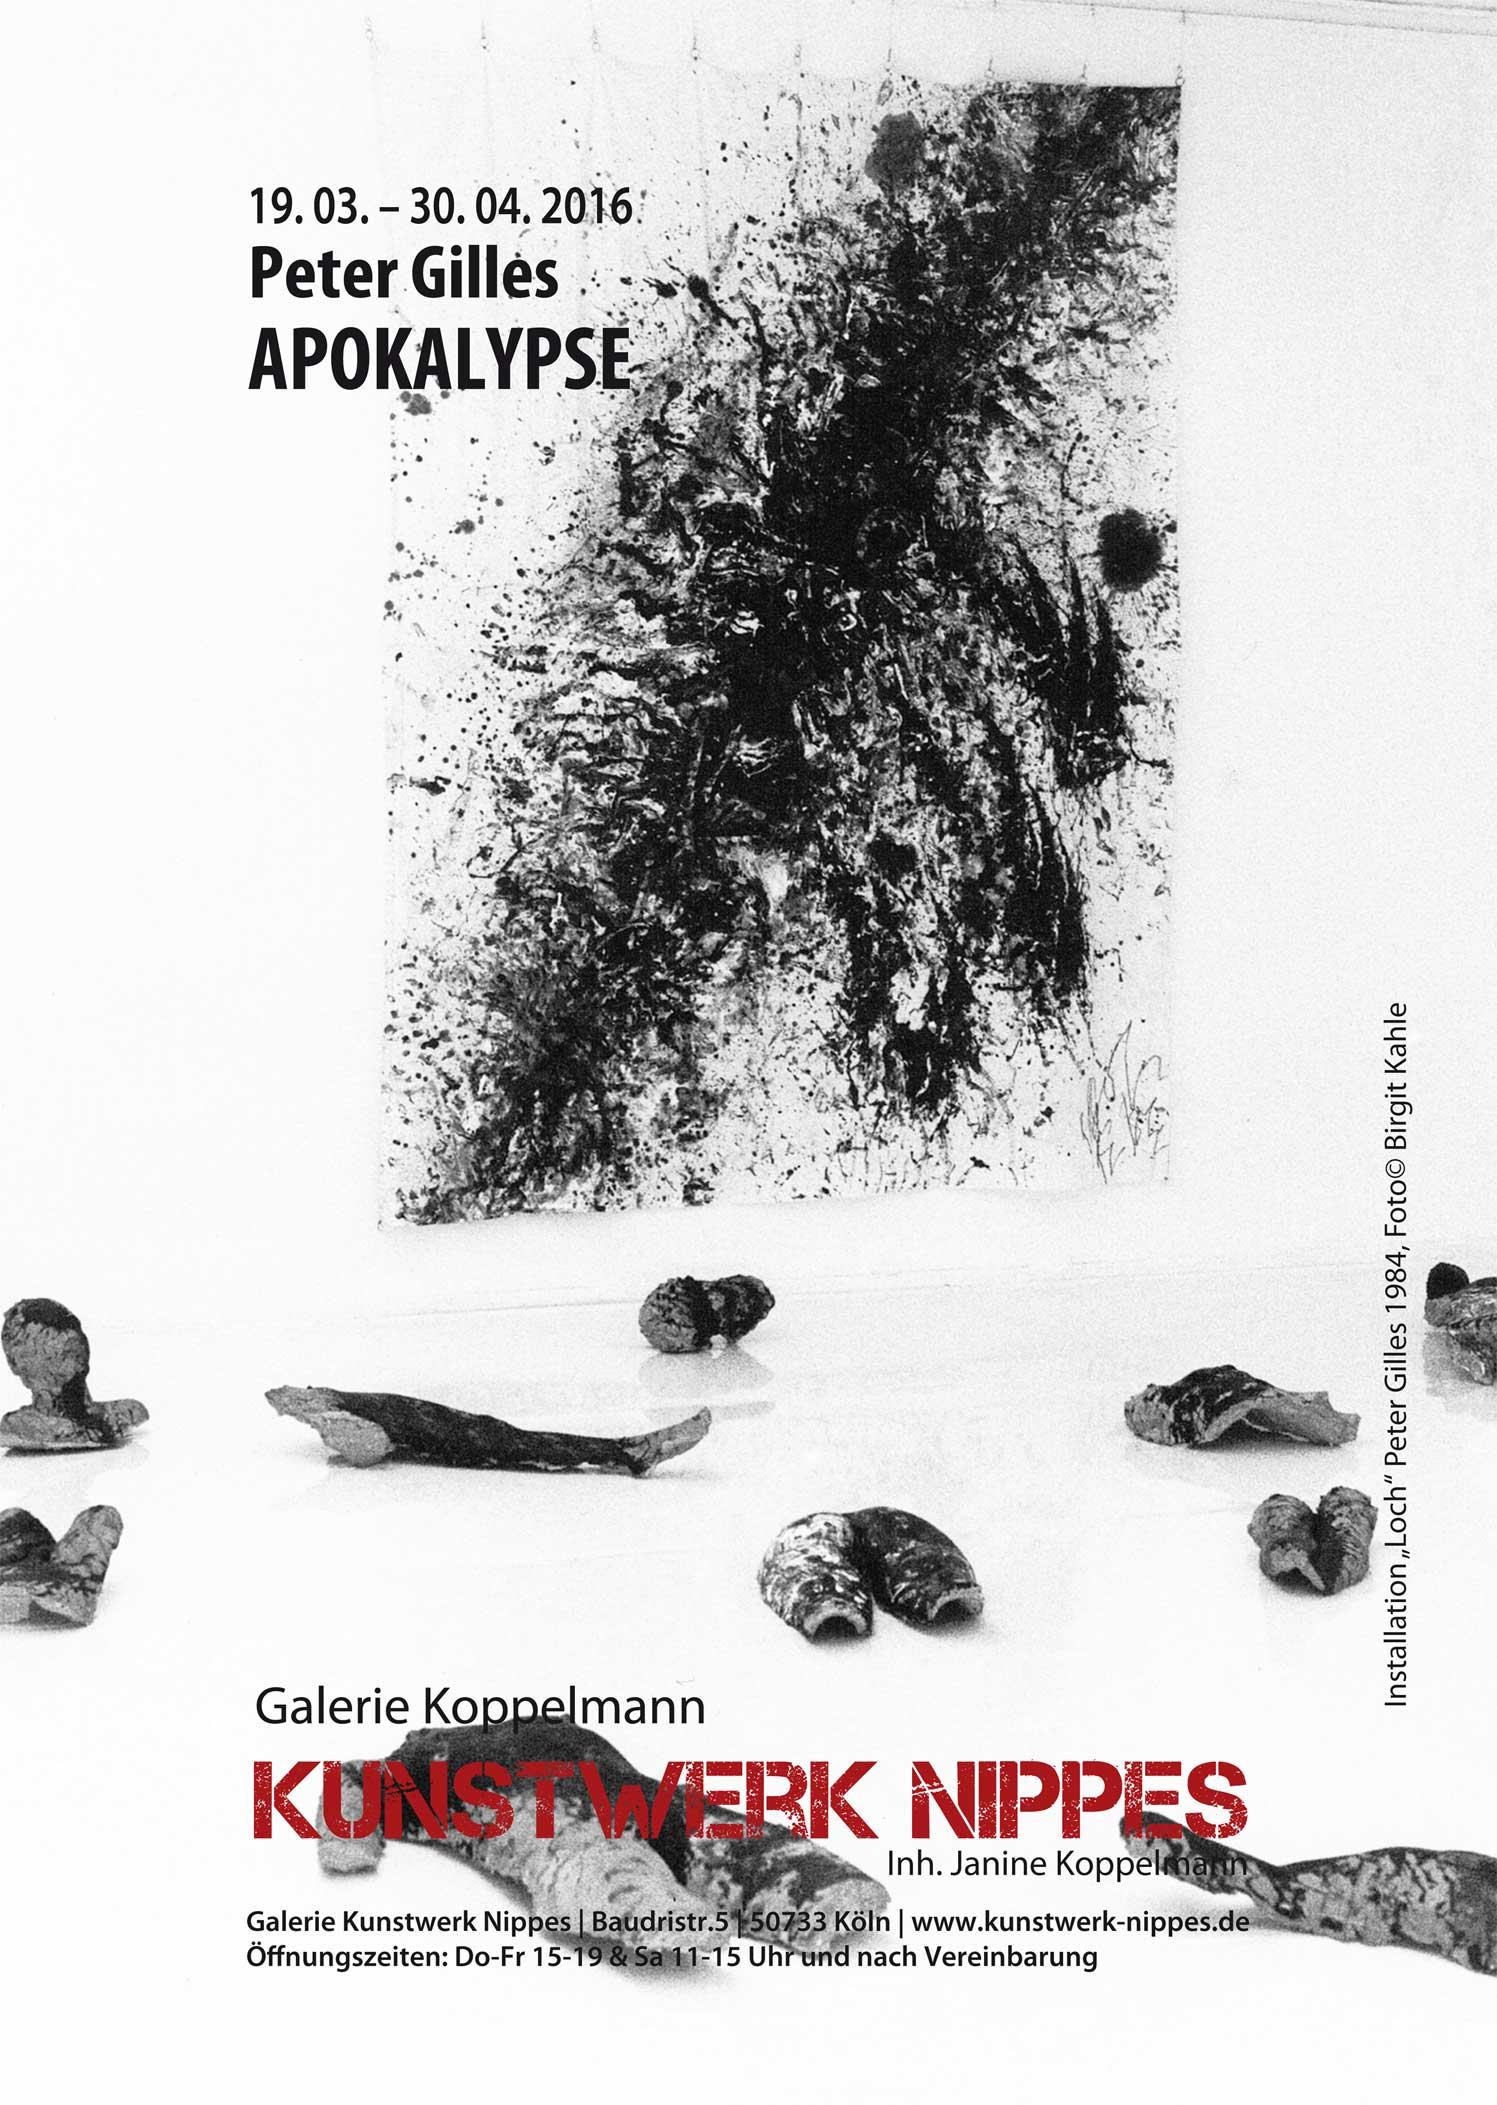 web-plakat-apokalypse